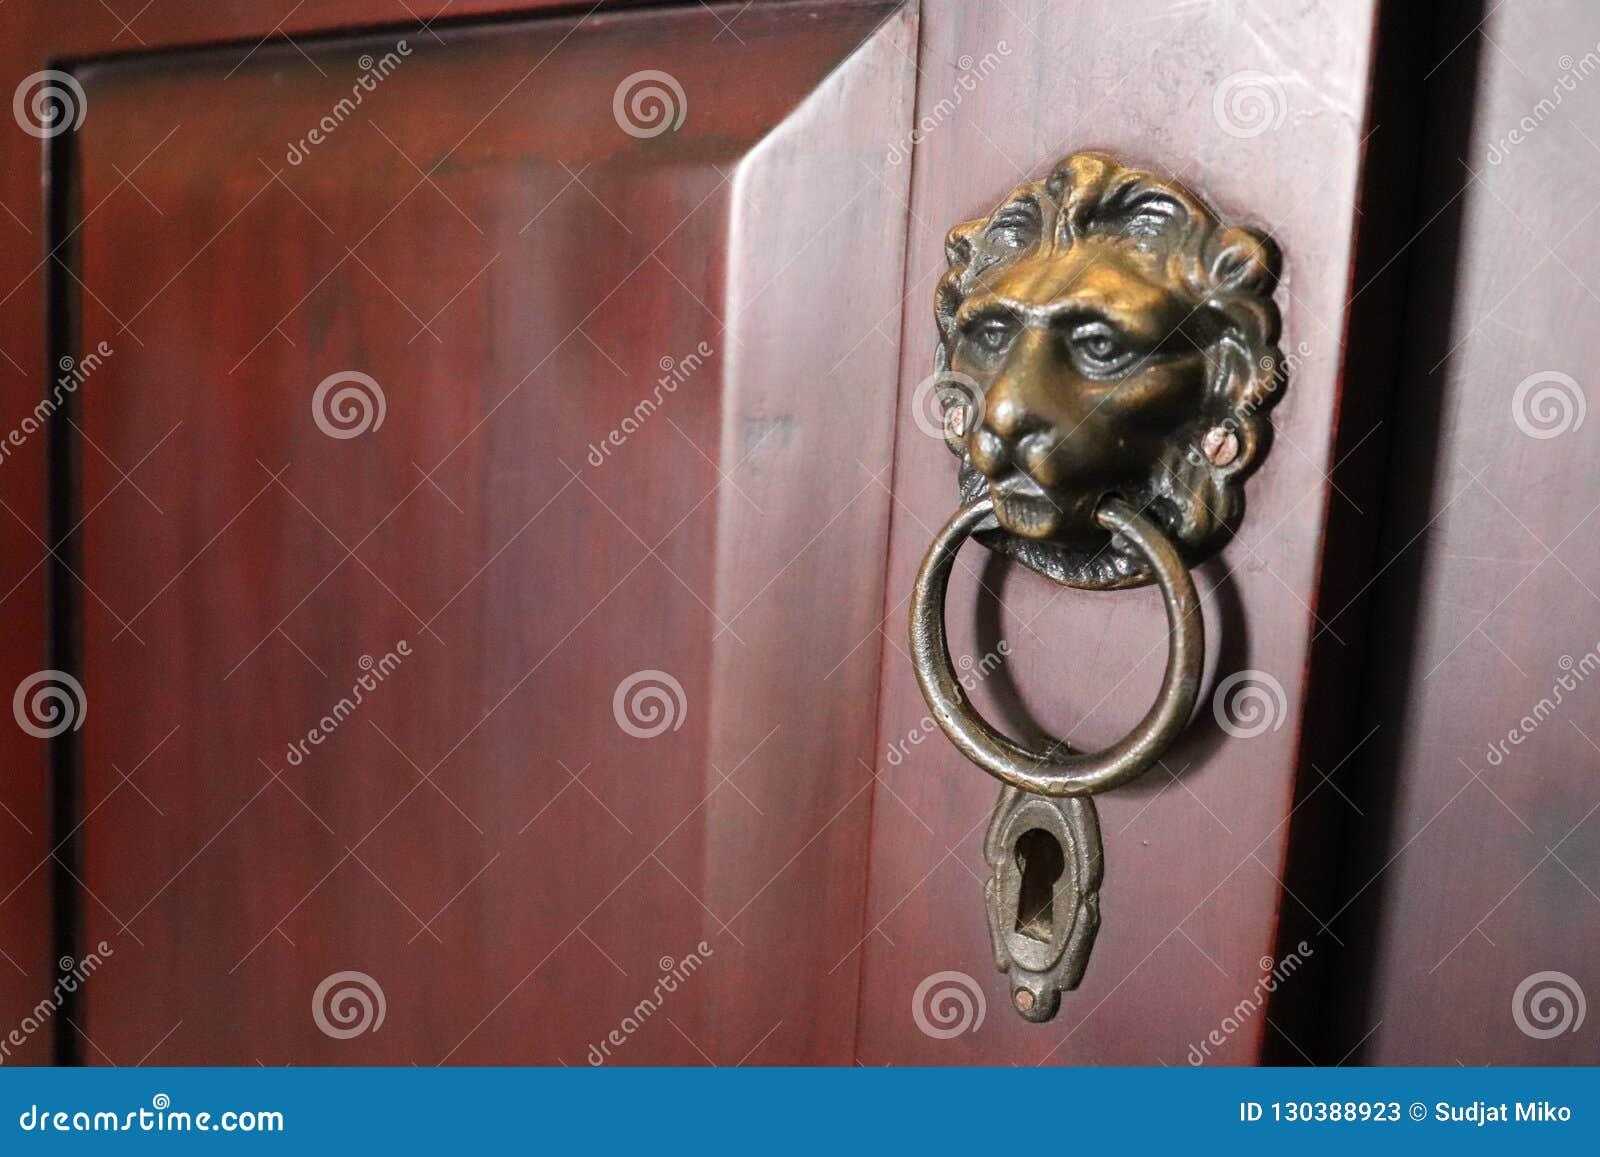 Doorknob golden lion head and keyhole